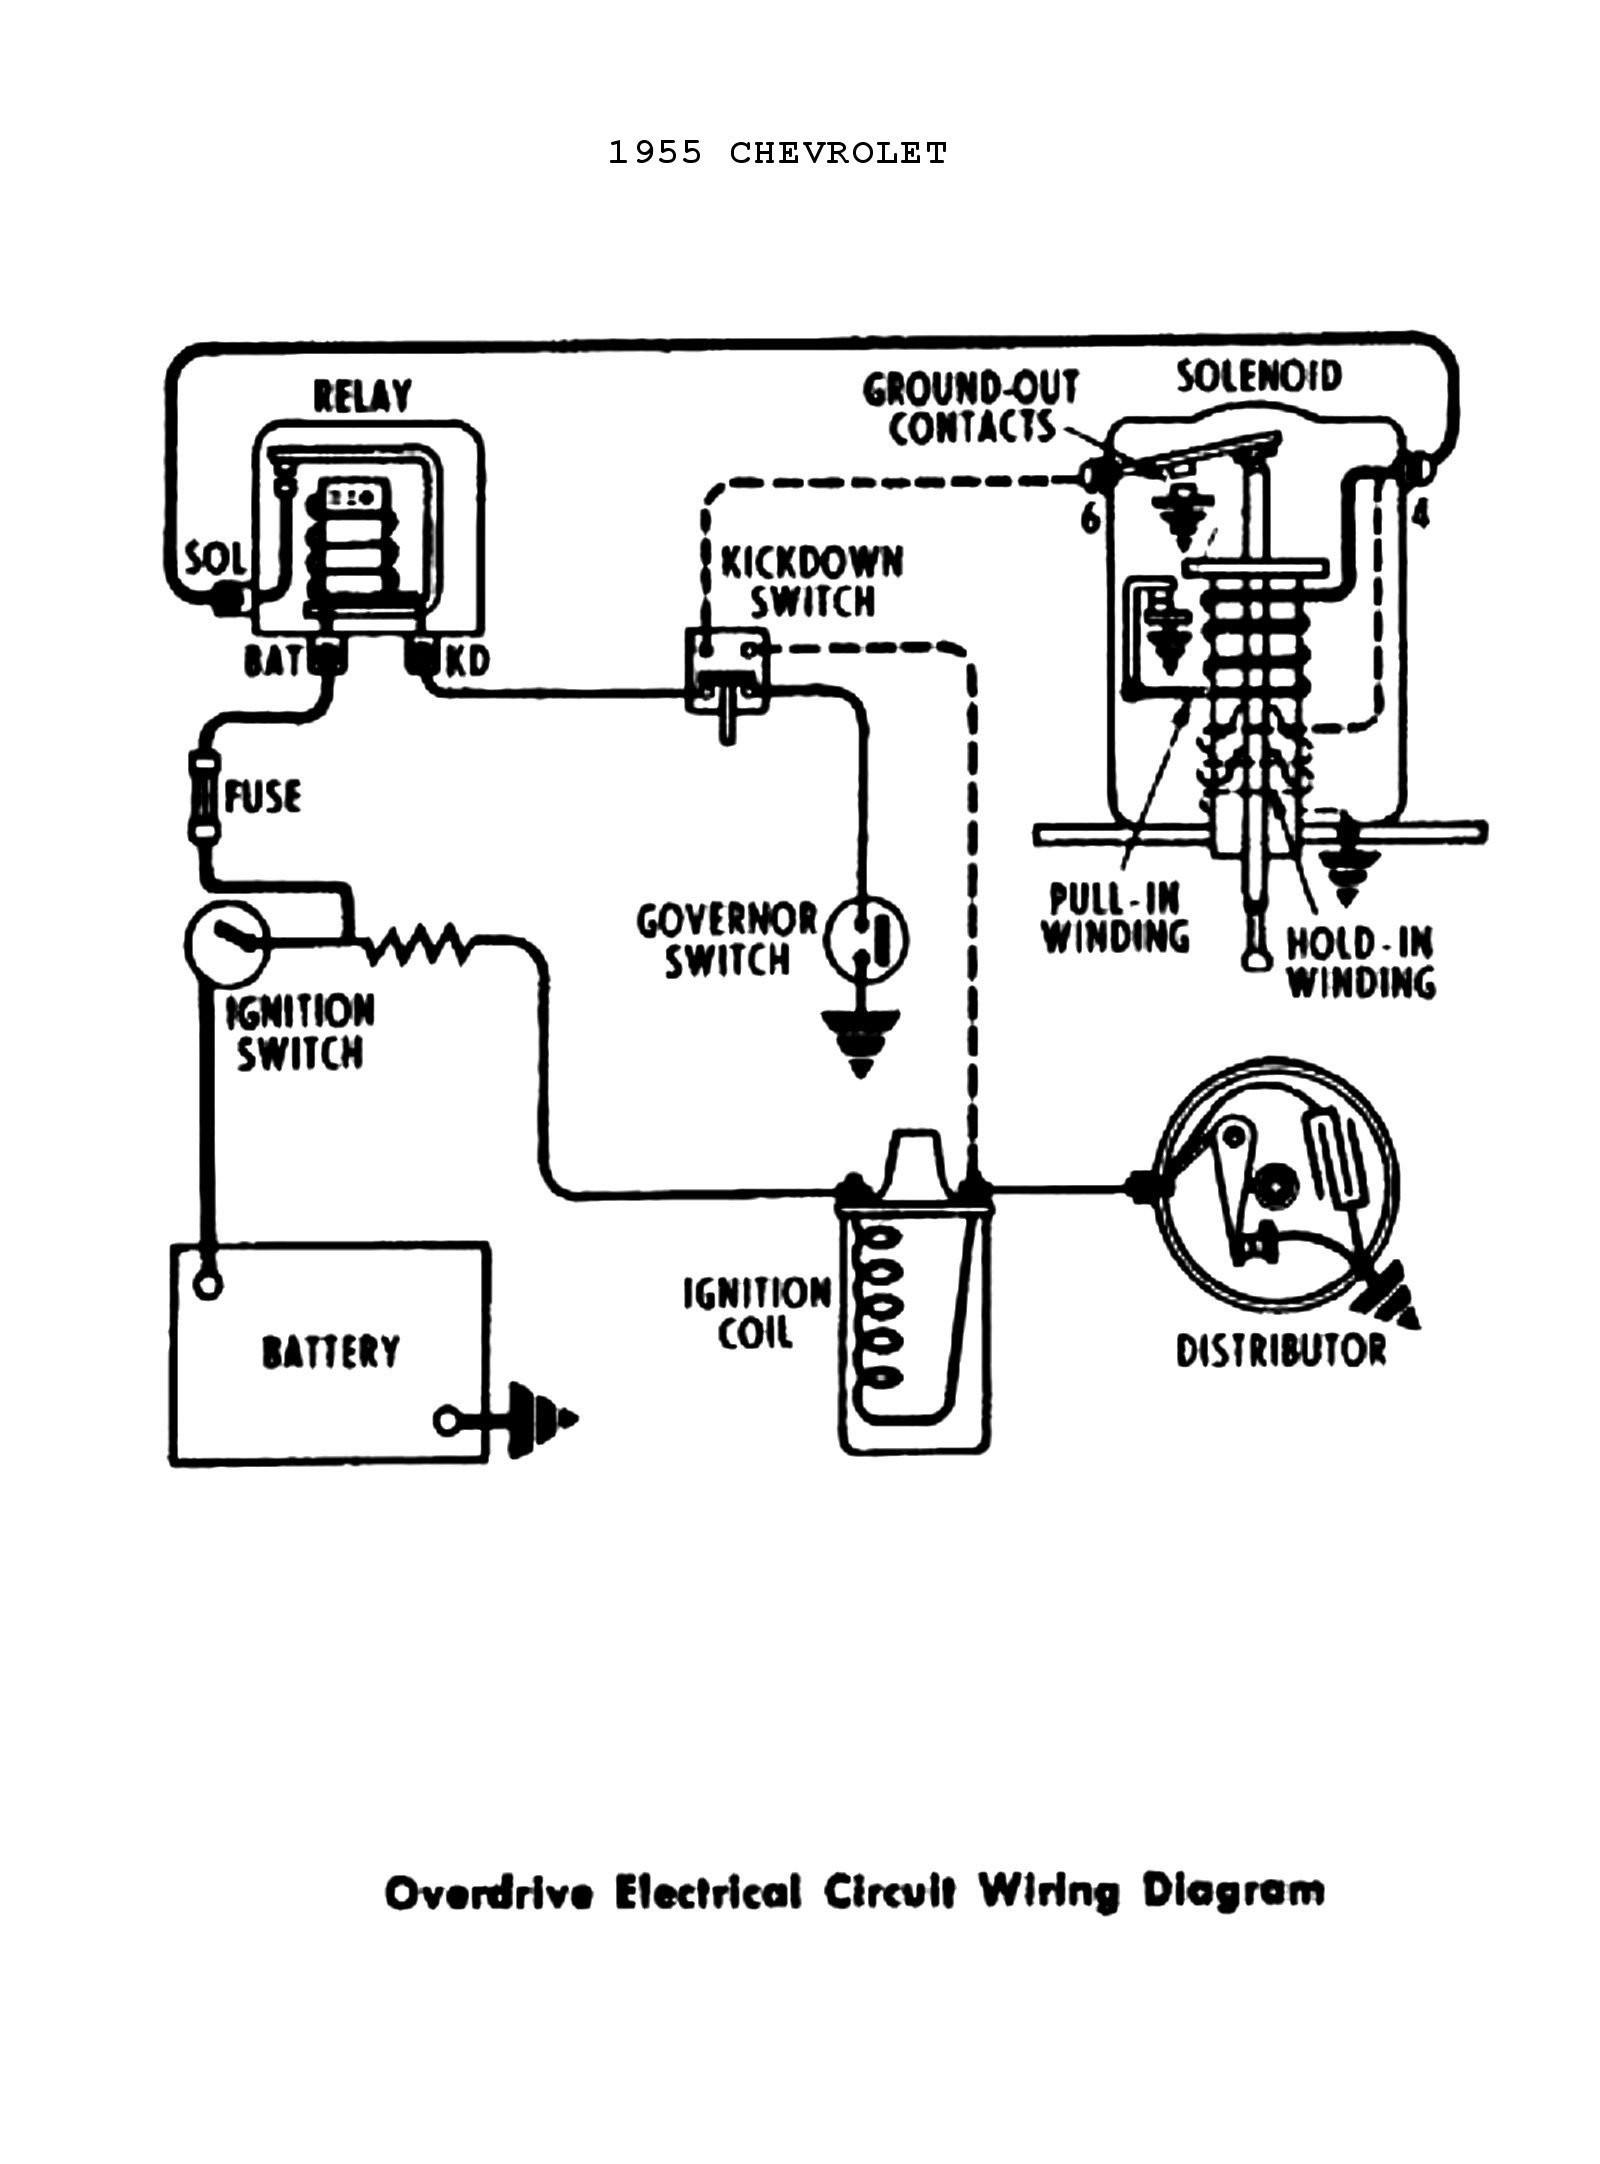 Basic ignition wiring diagram unique wiring diagram image rh mai reasurechest toyota igniter diagram 1995 toyota camry ignition wiring diagram